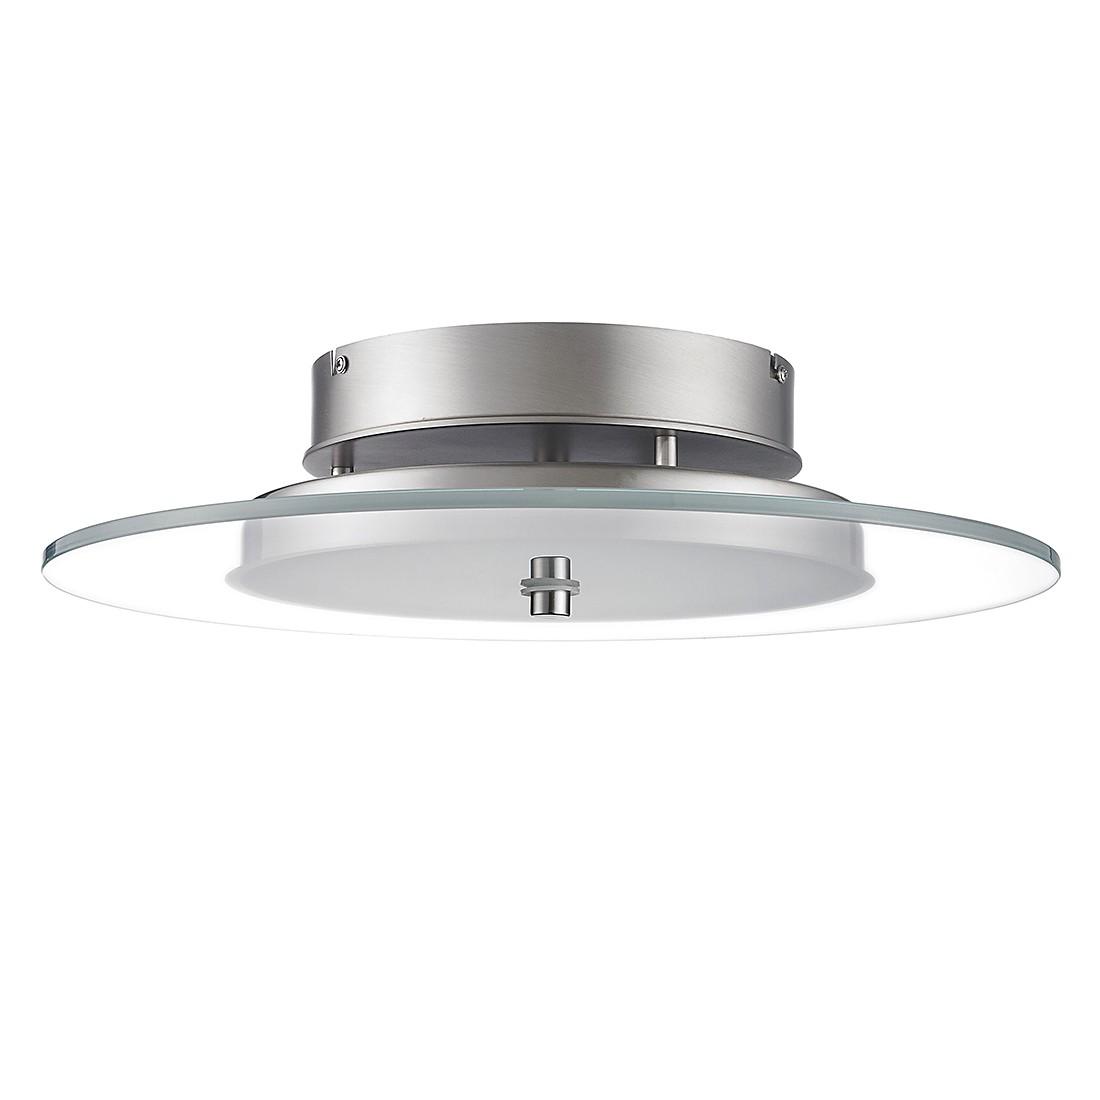 EEK A+, Deckenleuchte Verona Flutlicht – Metall – 1-flammig, Sorpetaler kaufen